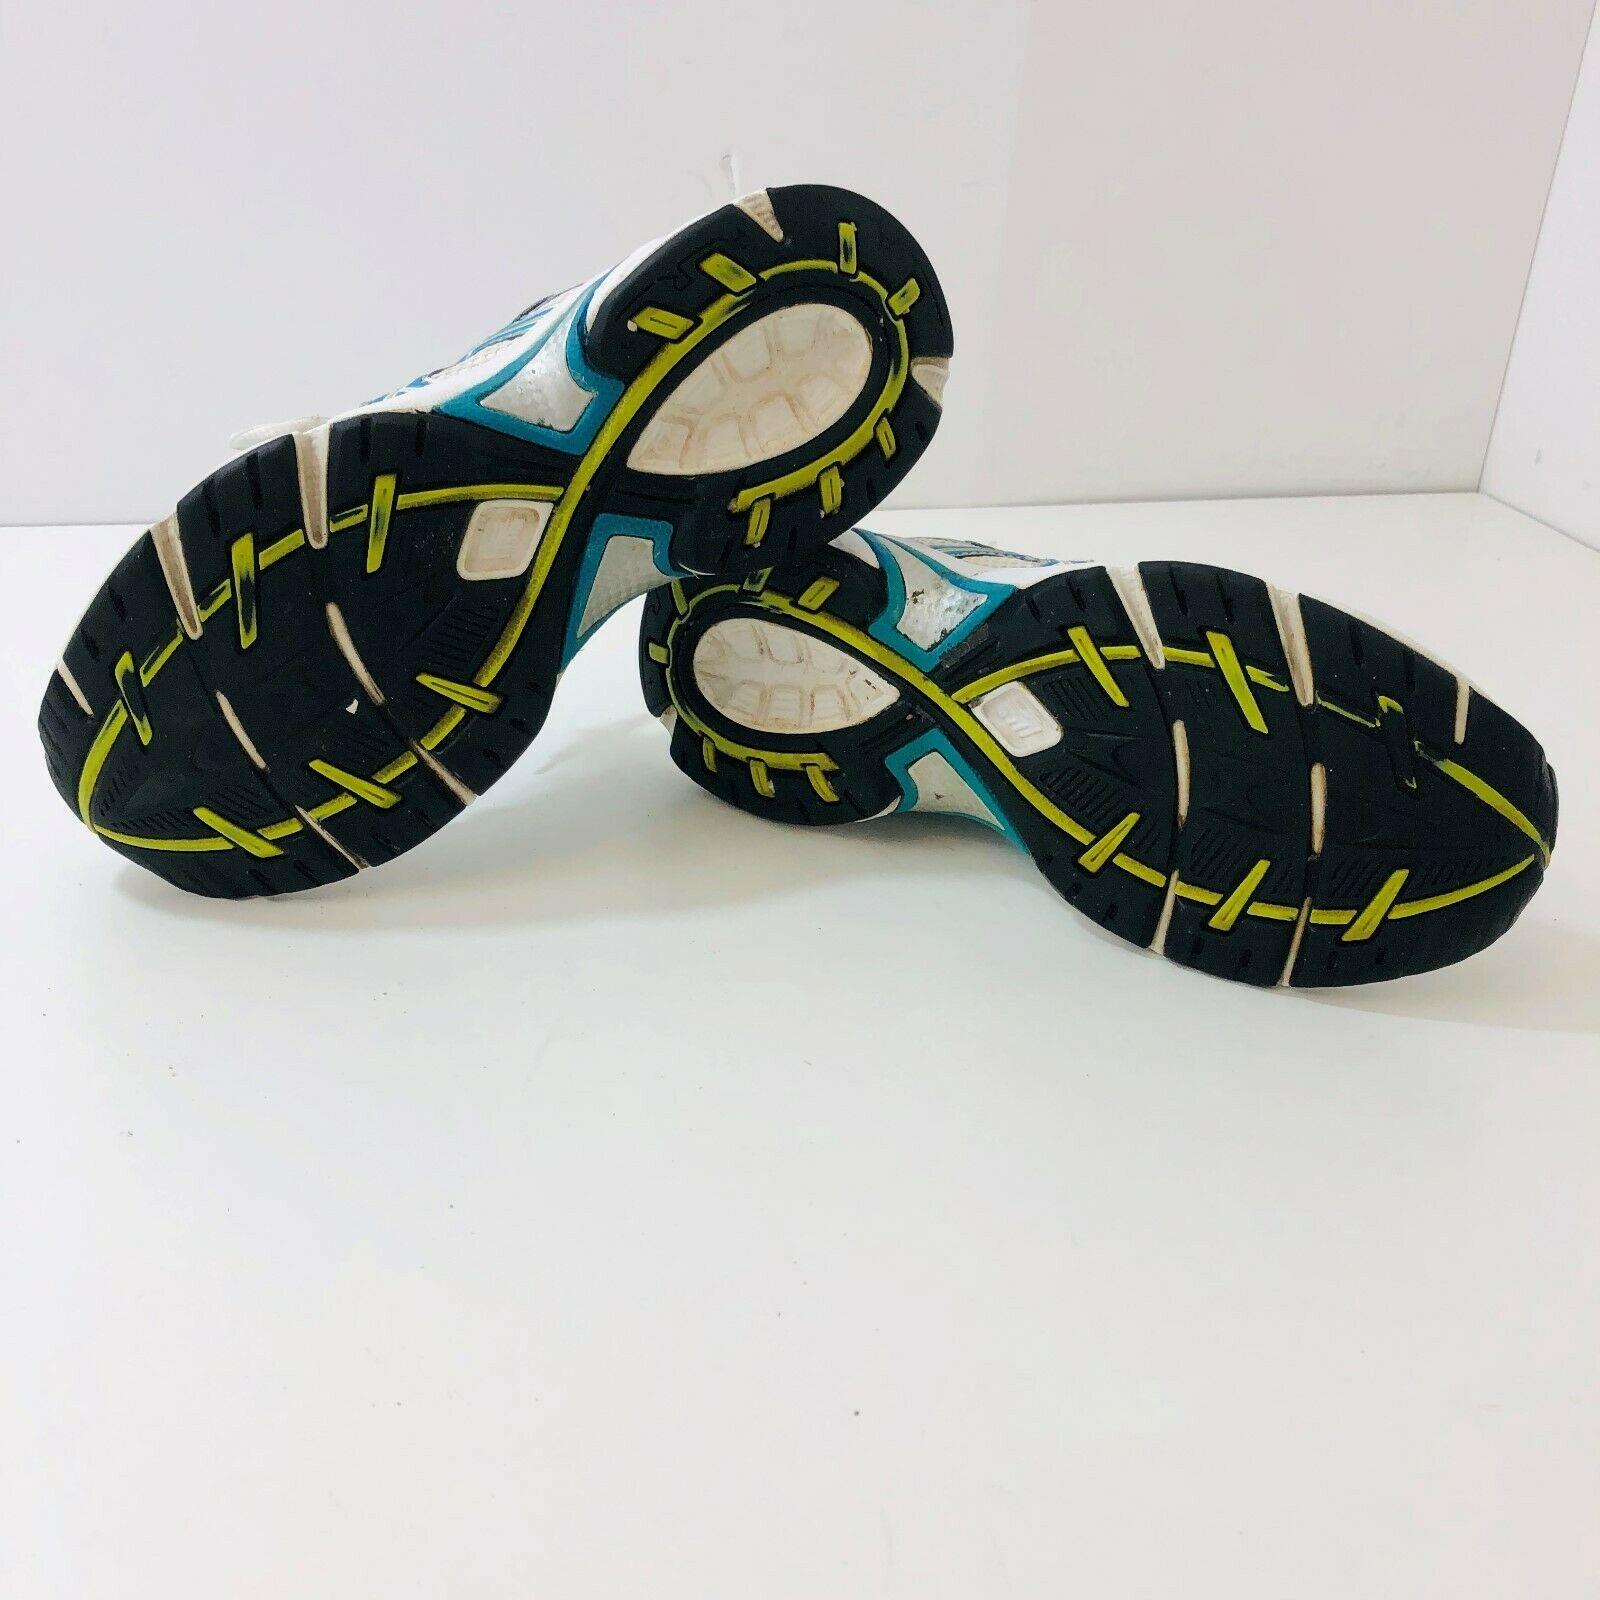 ASICS Gel-Impression 3 Womens Running Shoes Sneakers White/Blue TOJ7N Size 7.5M